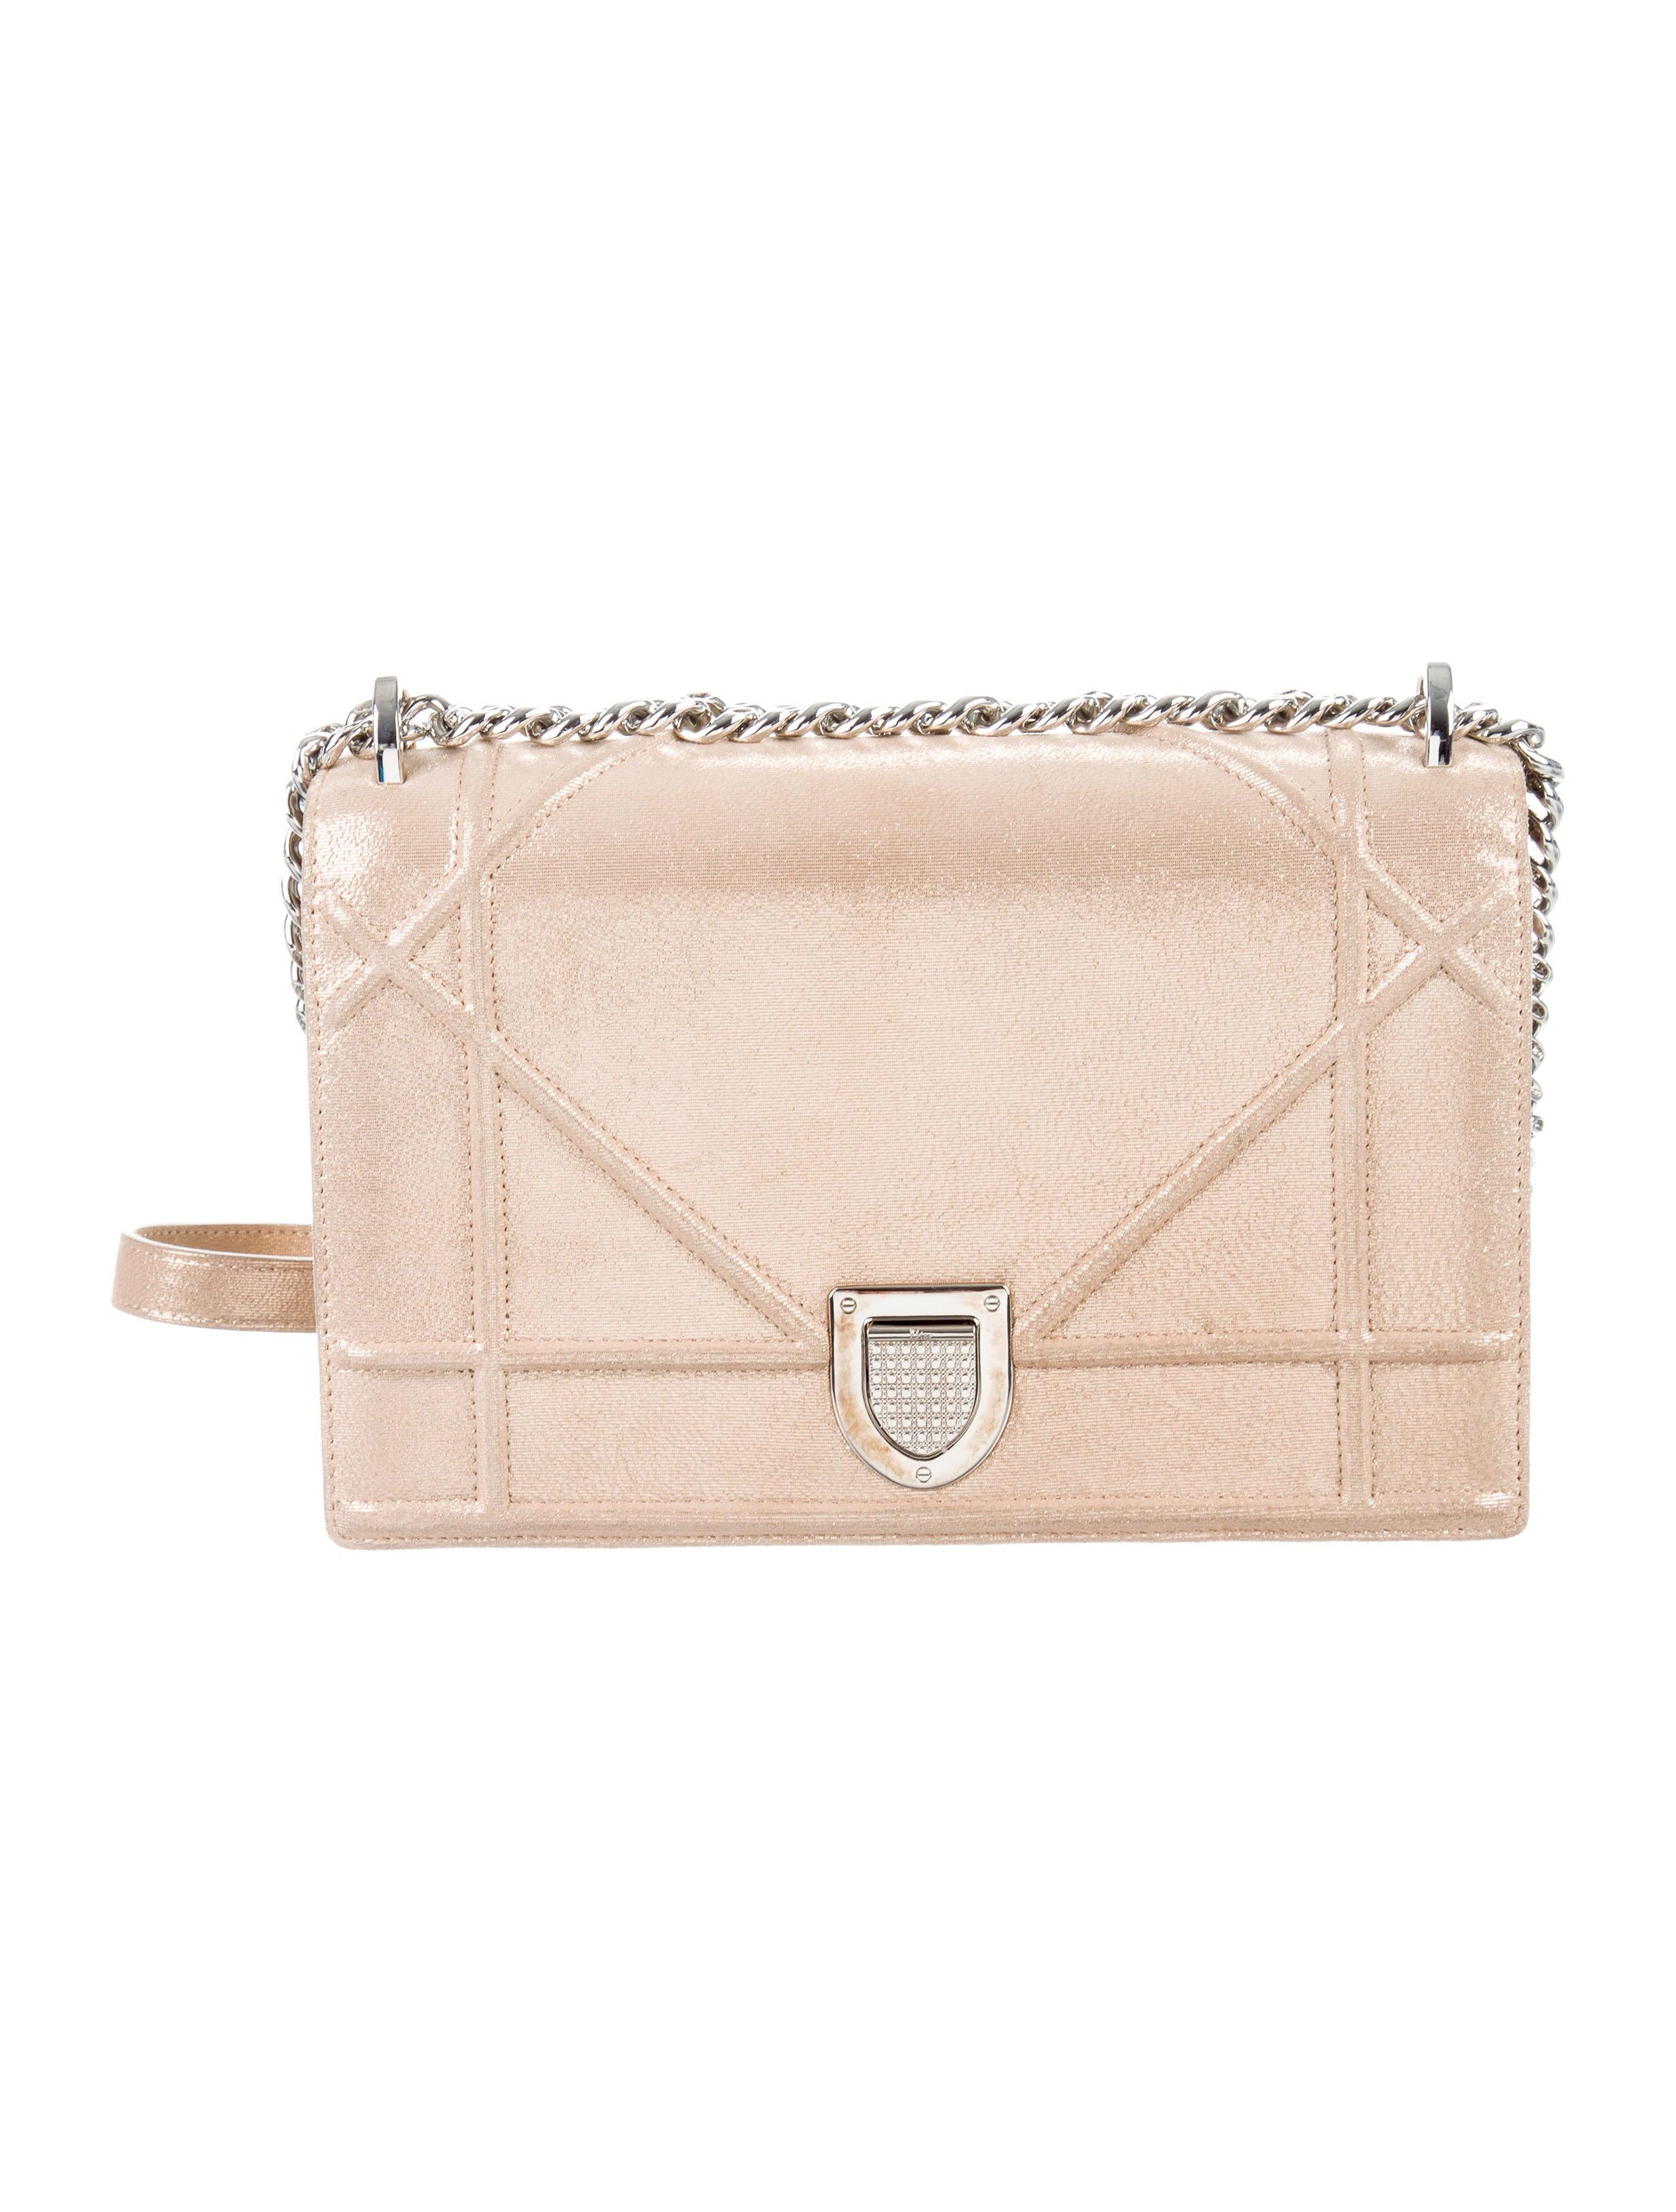 d349951beaf86c Christian Dior Metallic Diorama Bag - Handbags - CHR61822   The RealReal